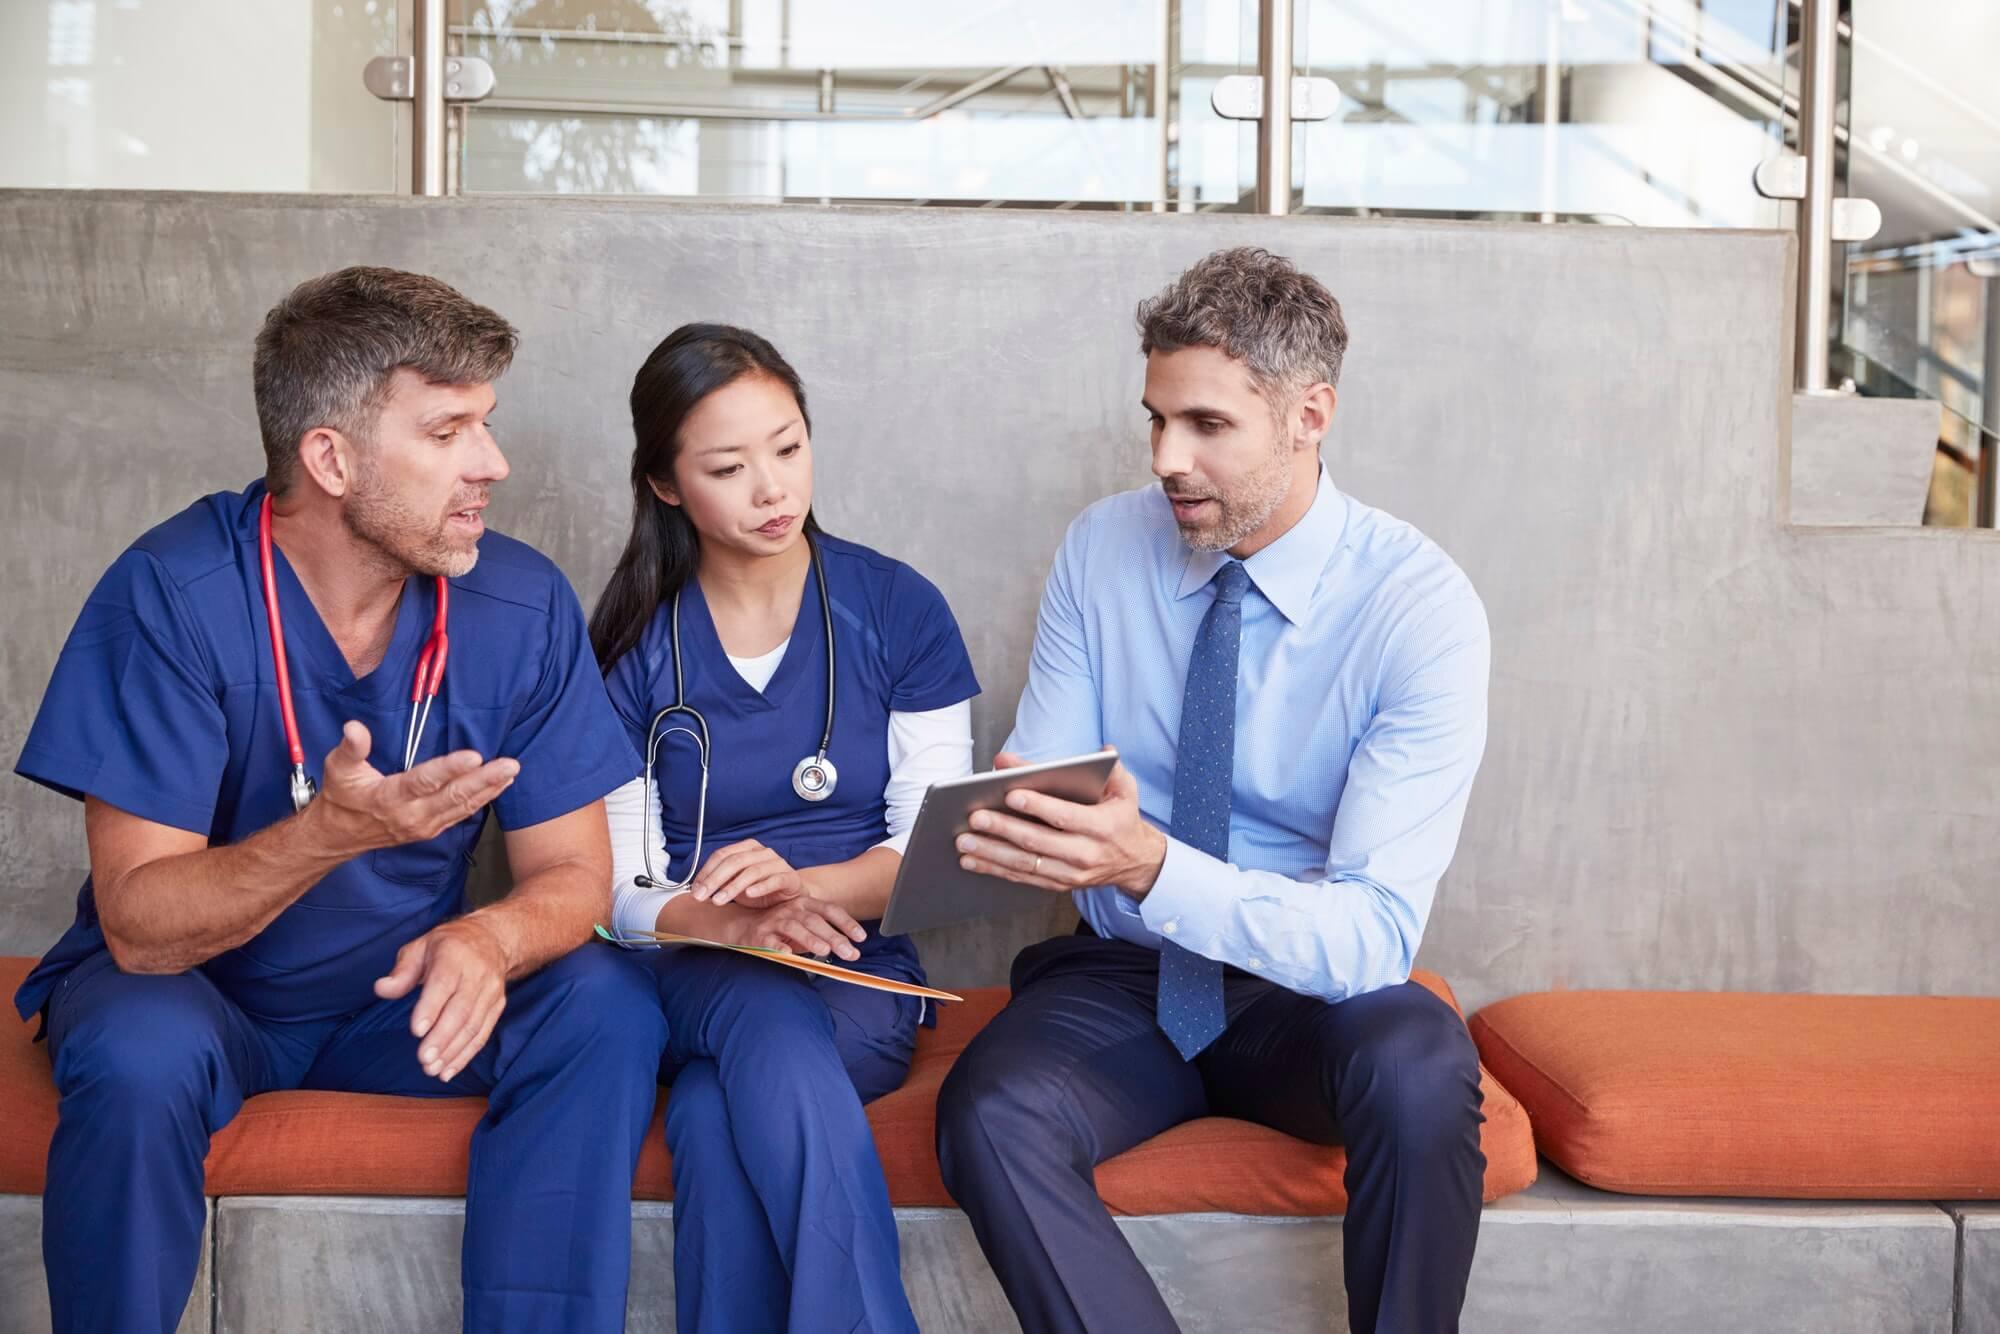 B2B Healthcare Sales & Marketing